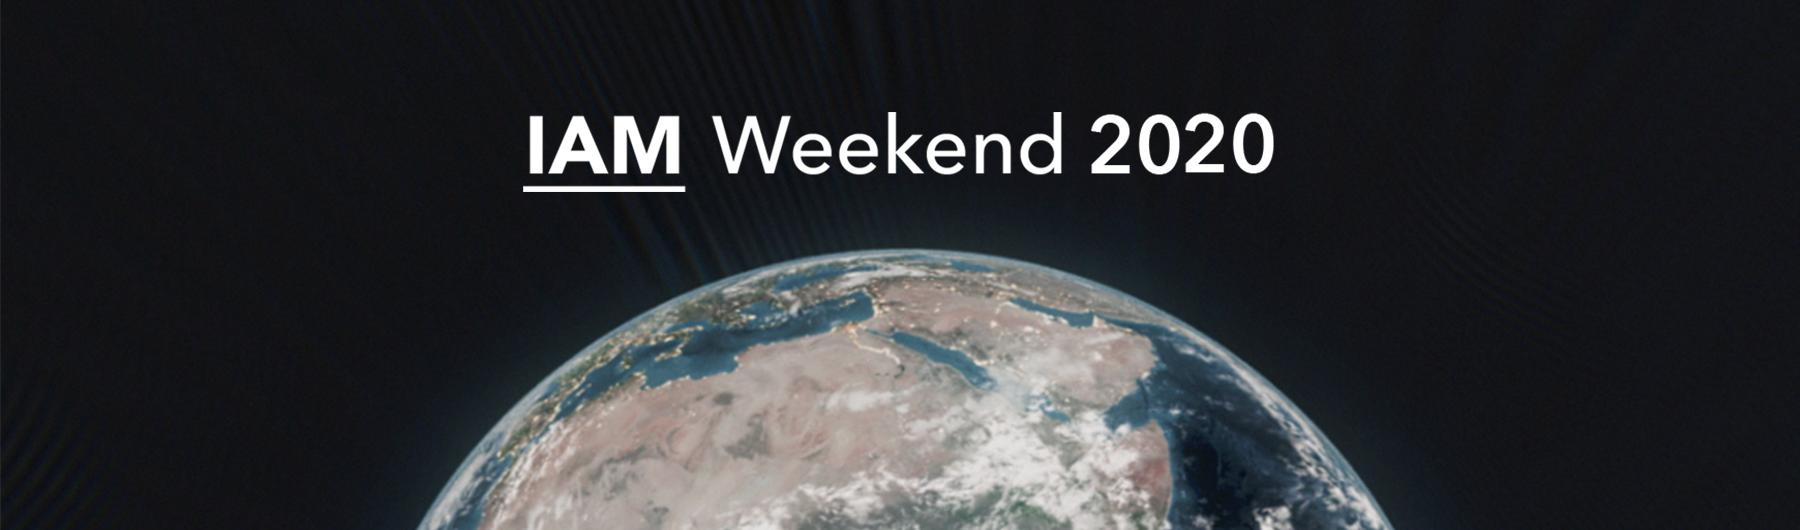 IAM Weekend 2020